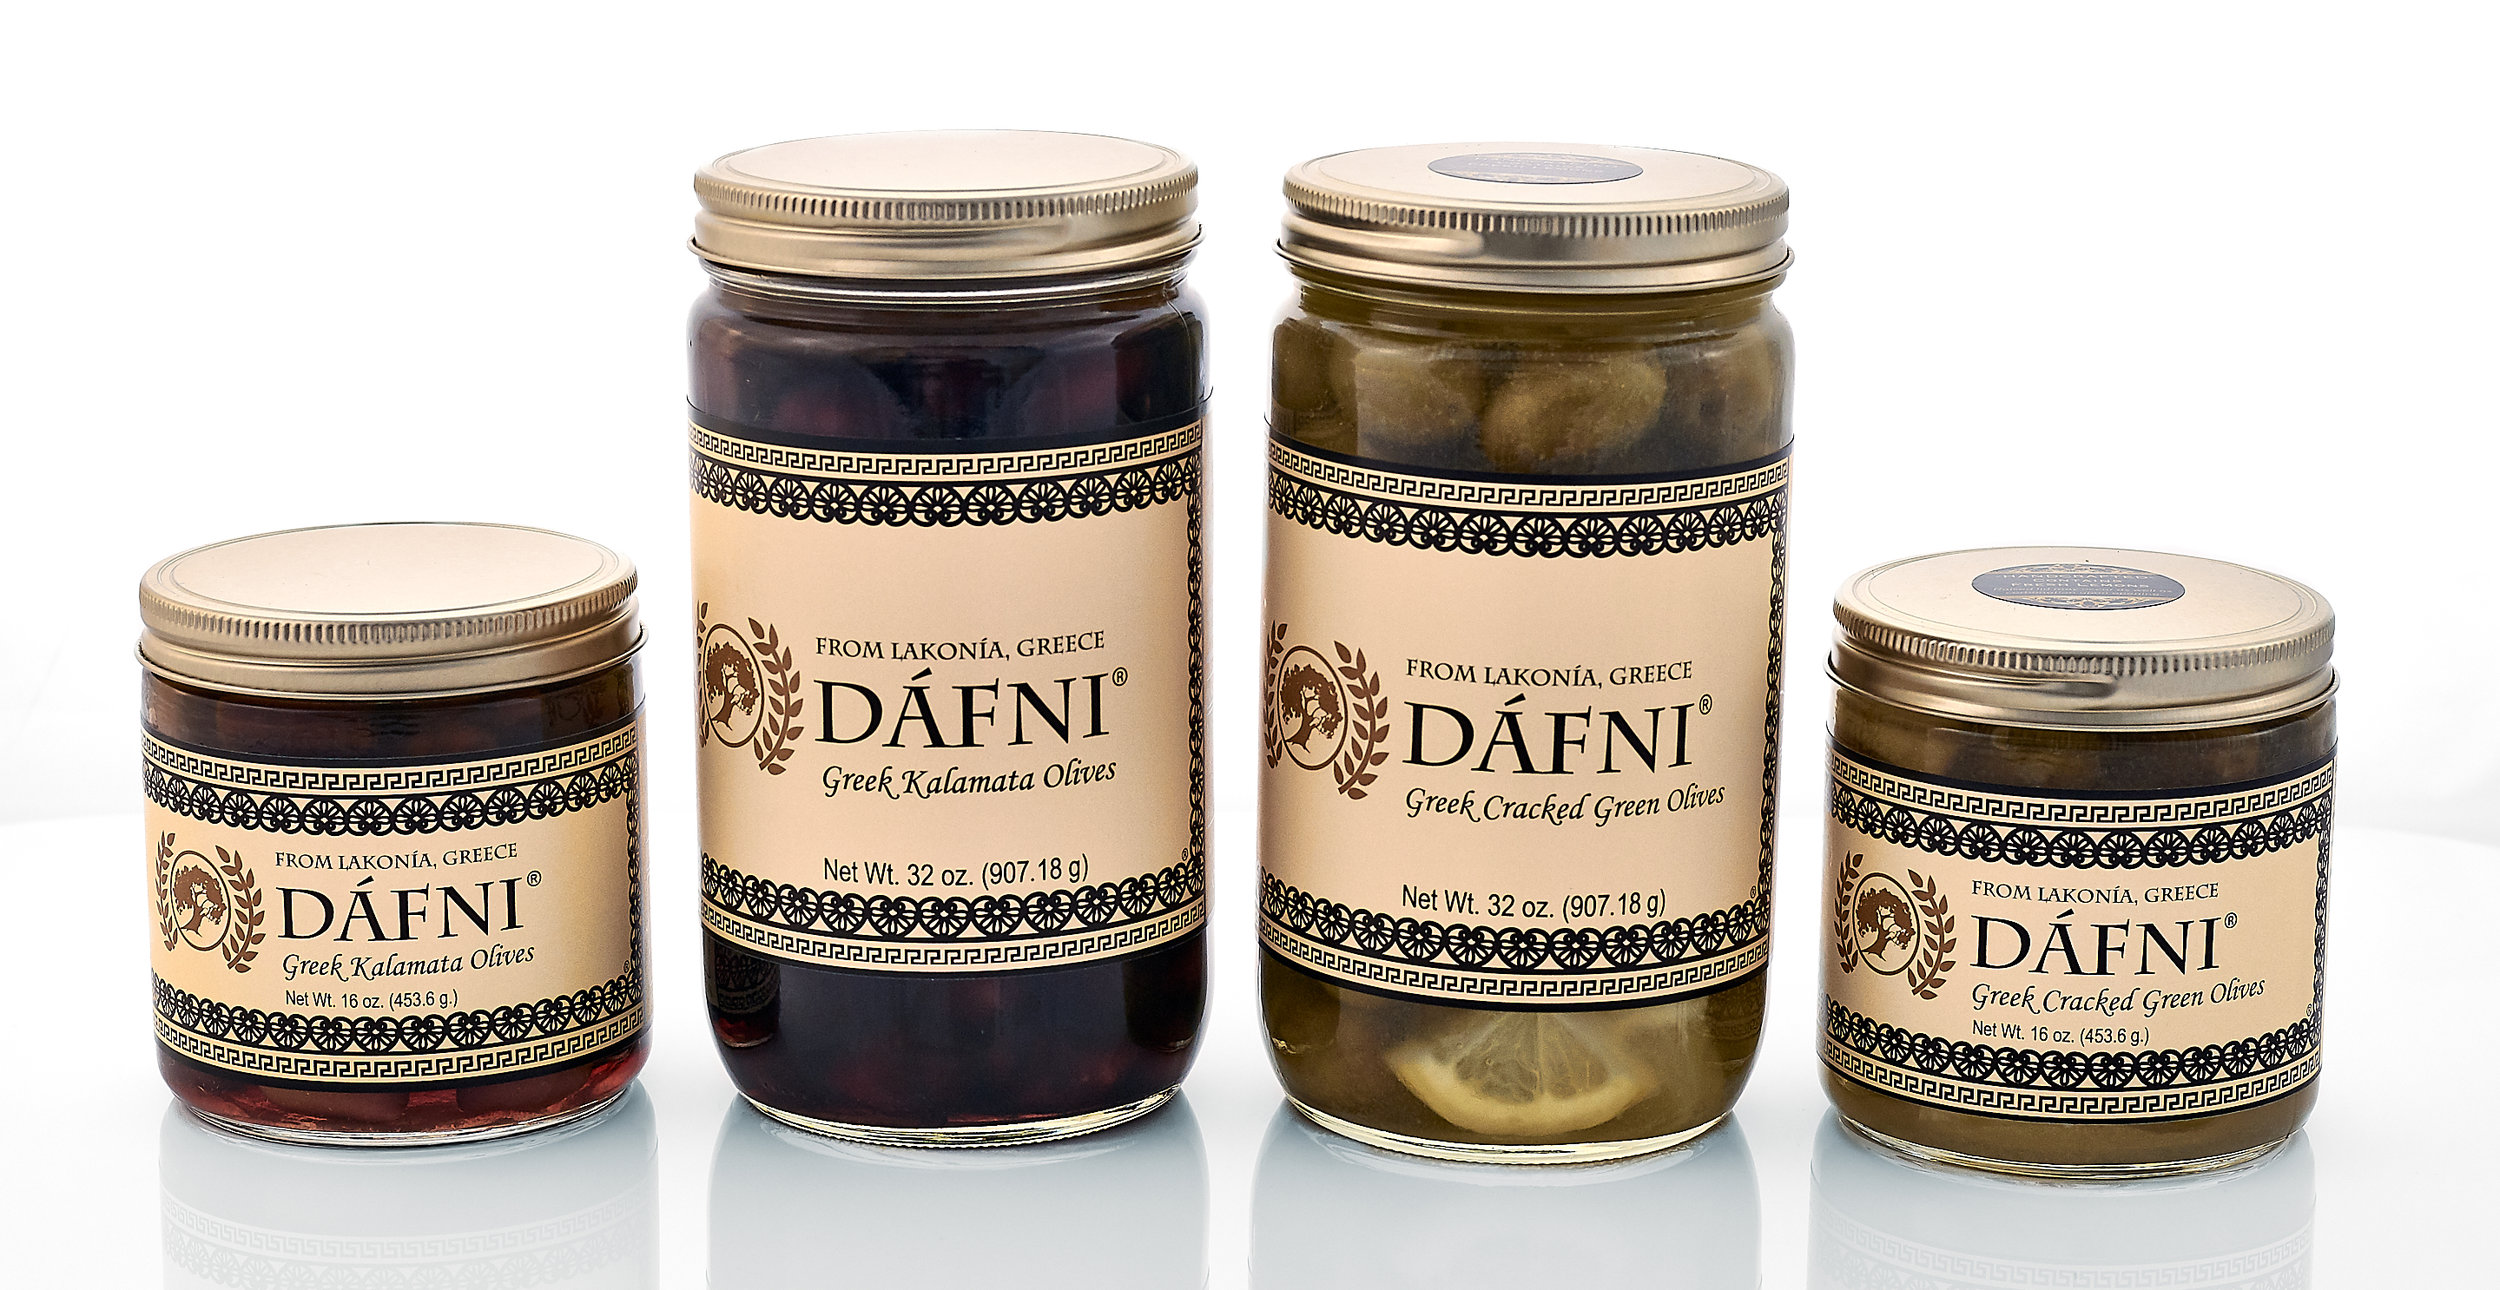 DAFNI Greek Gourmet